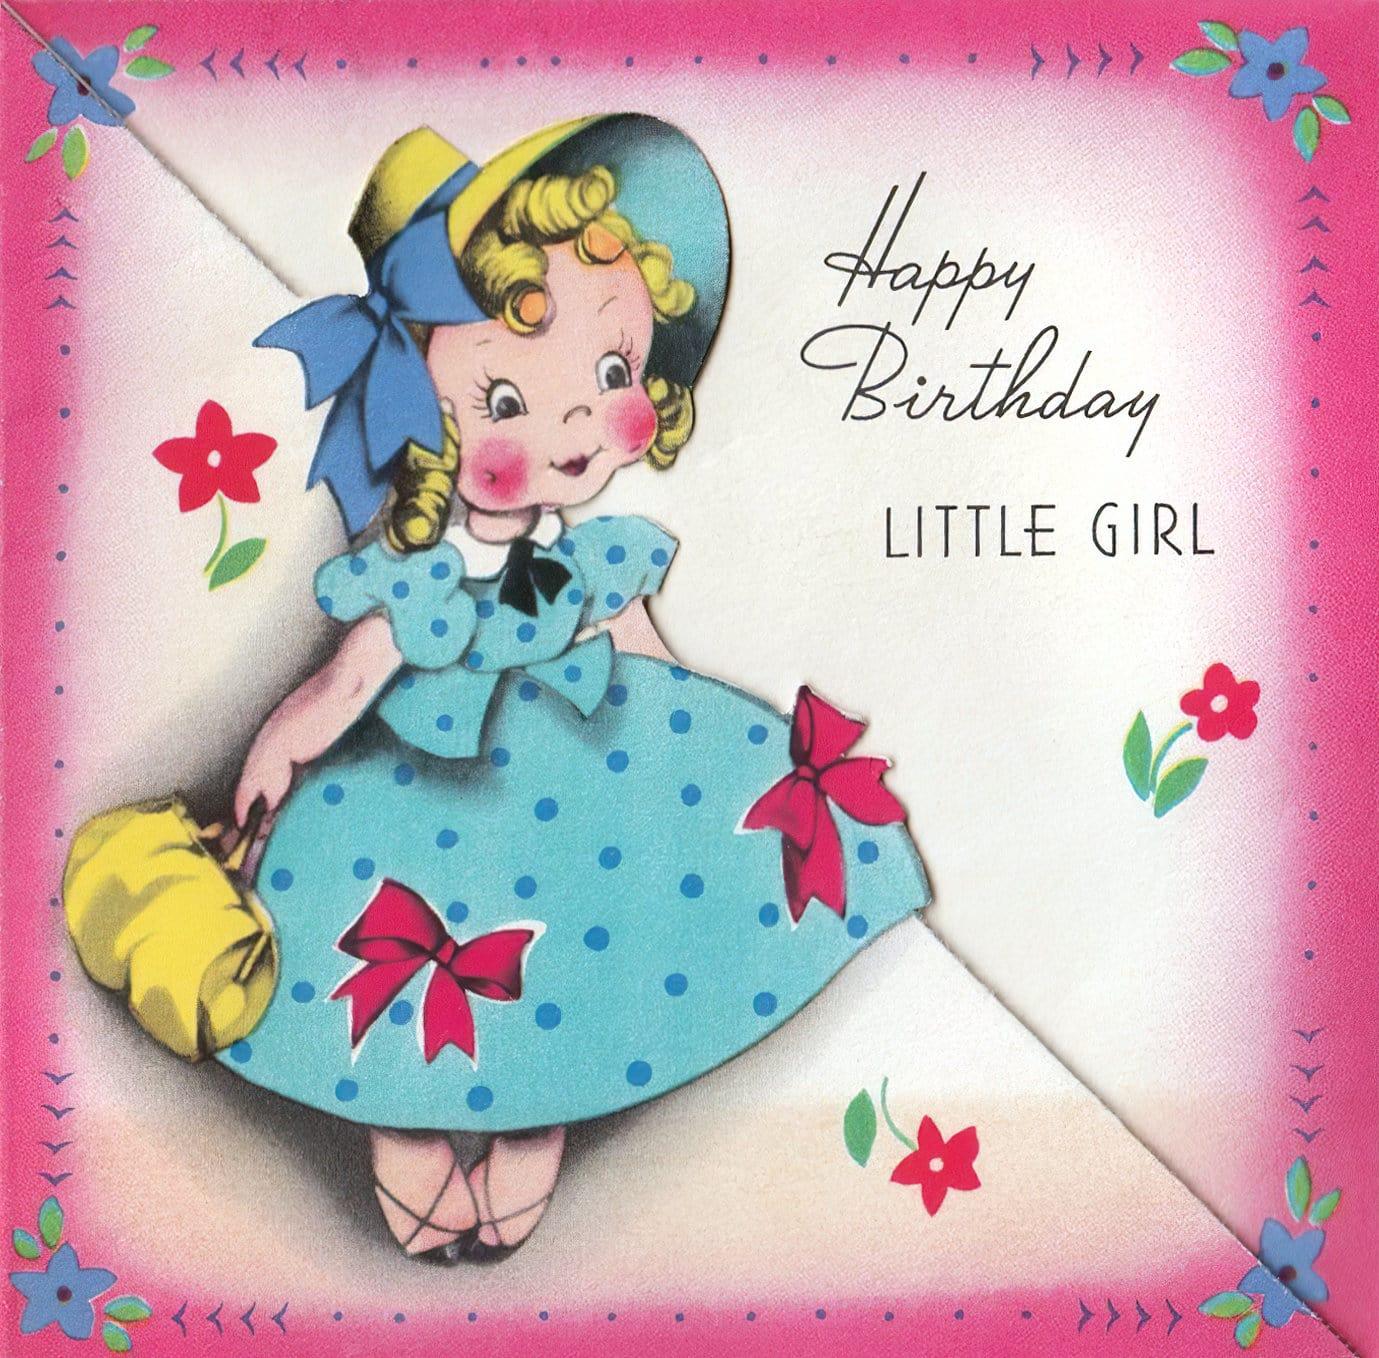 Vintage 1940s birthday card - Little girl